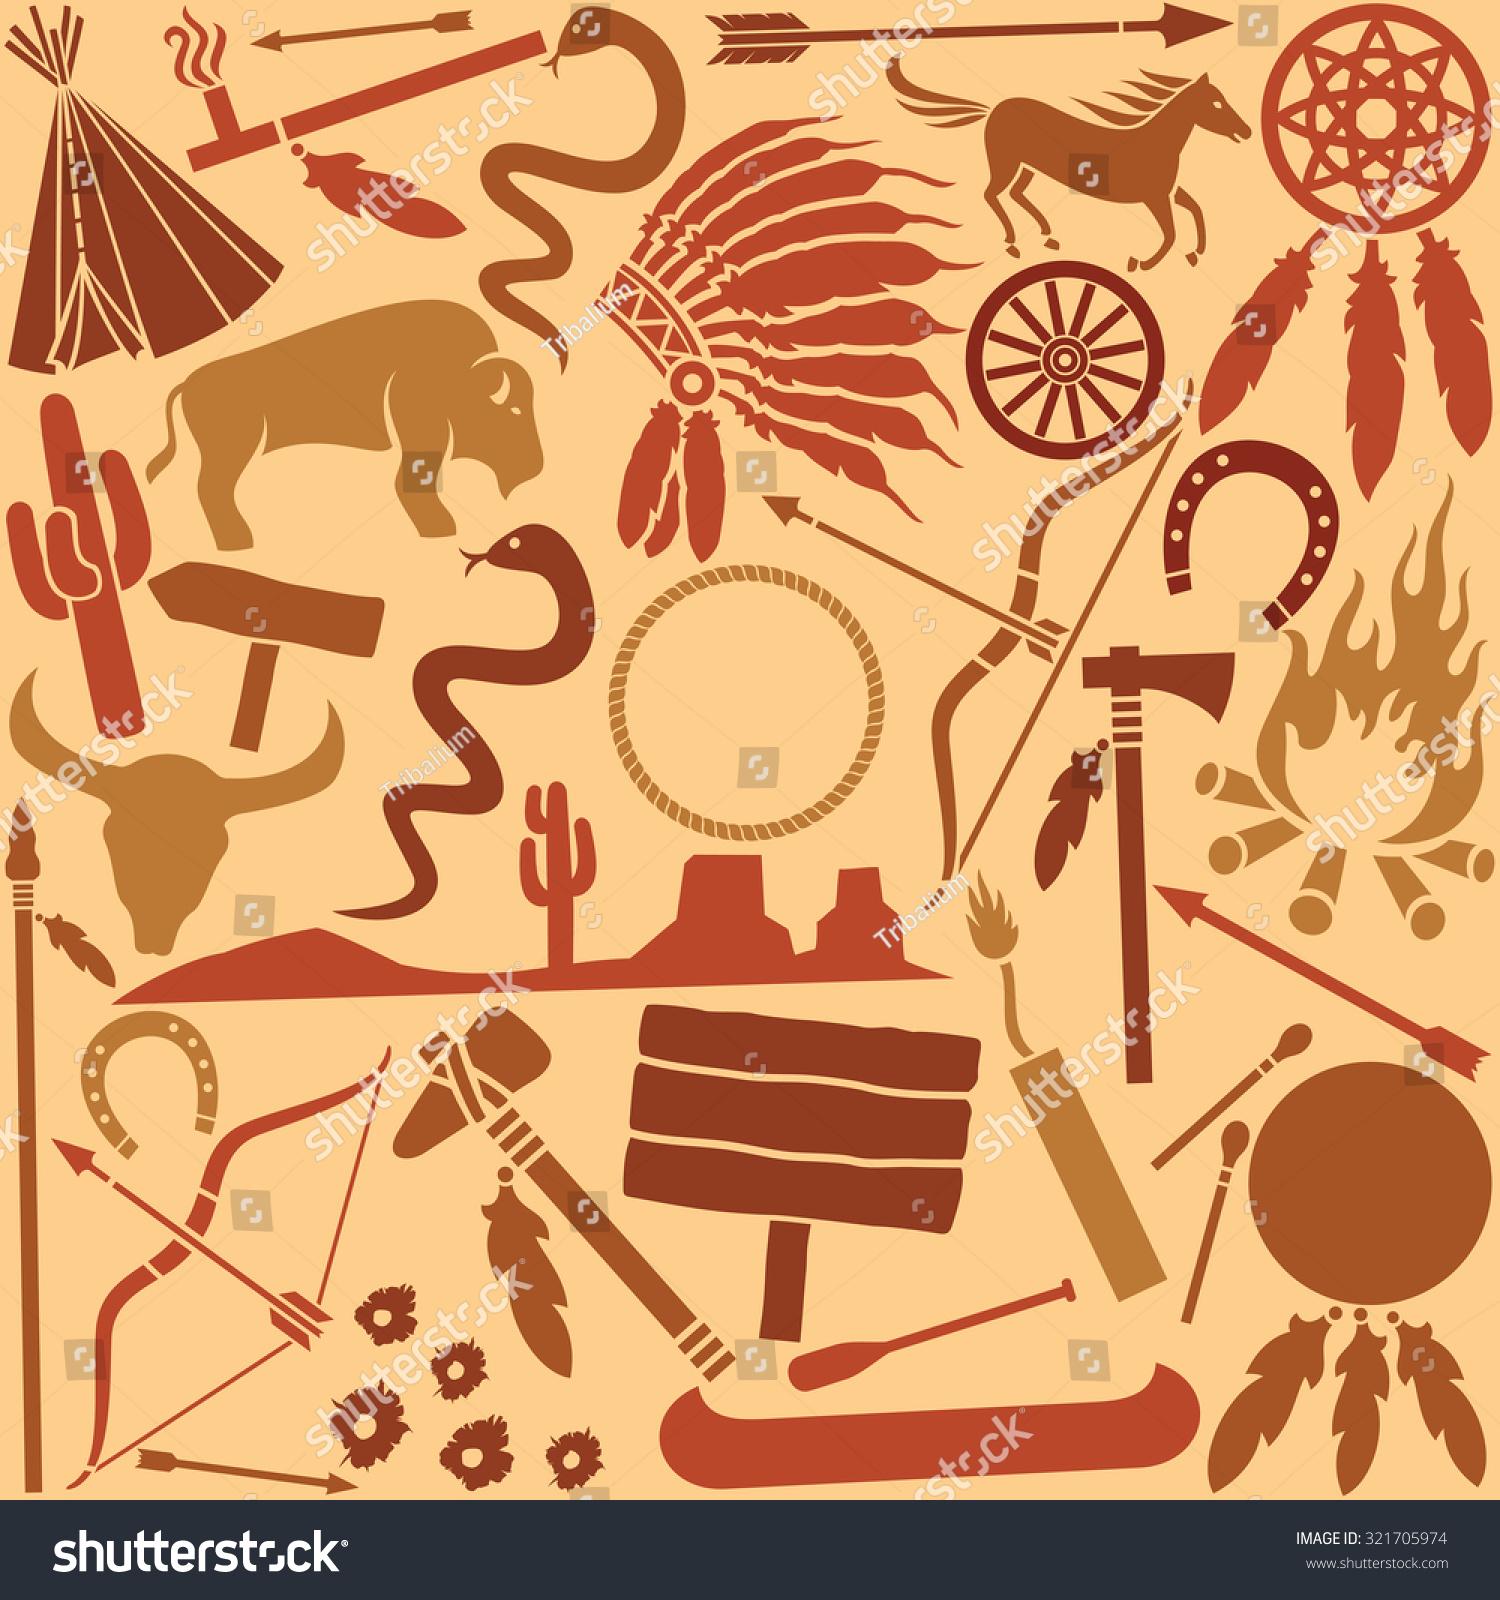 Native american indians icons seamless pattern stock vector native american indians icons seamless pattern biocorpaavc